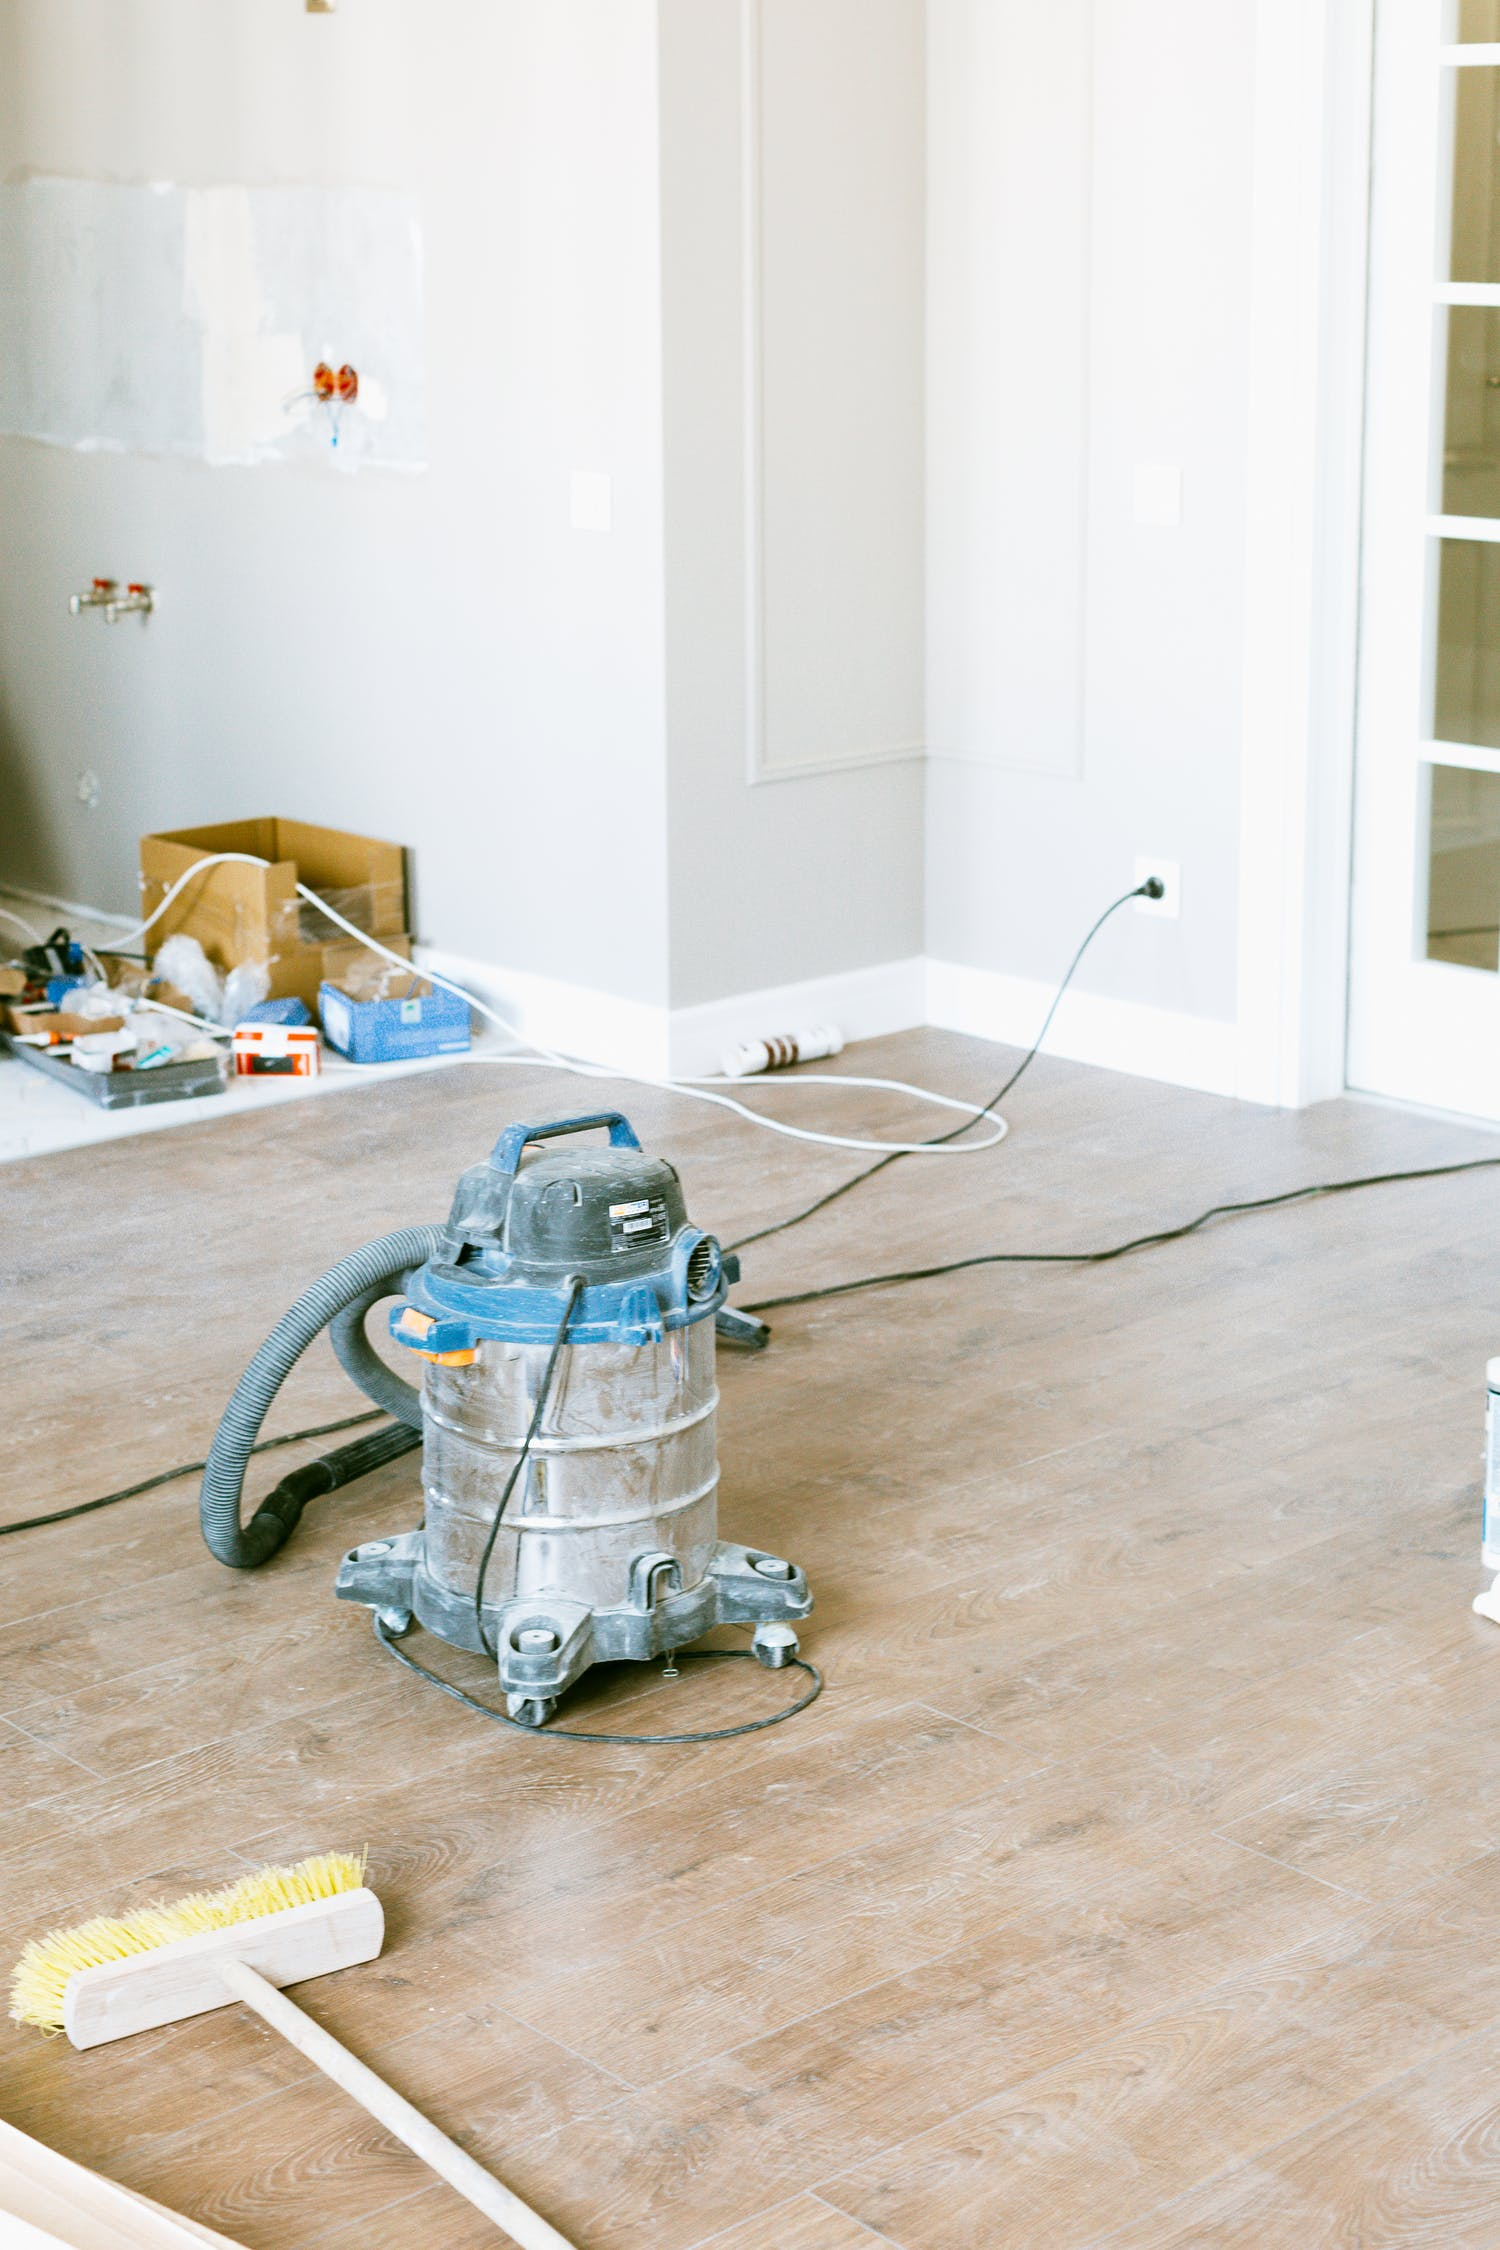 Photo of Vacuum Cleaner on Floor